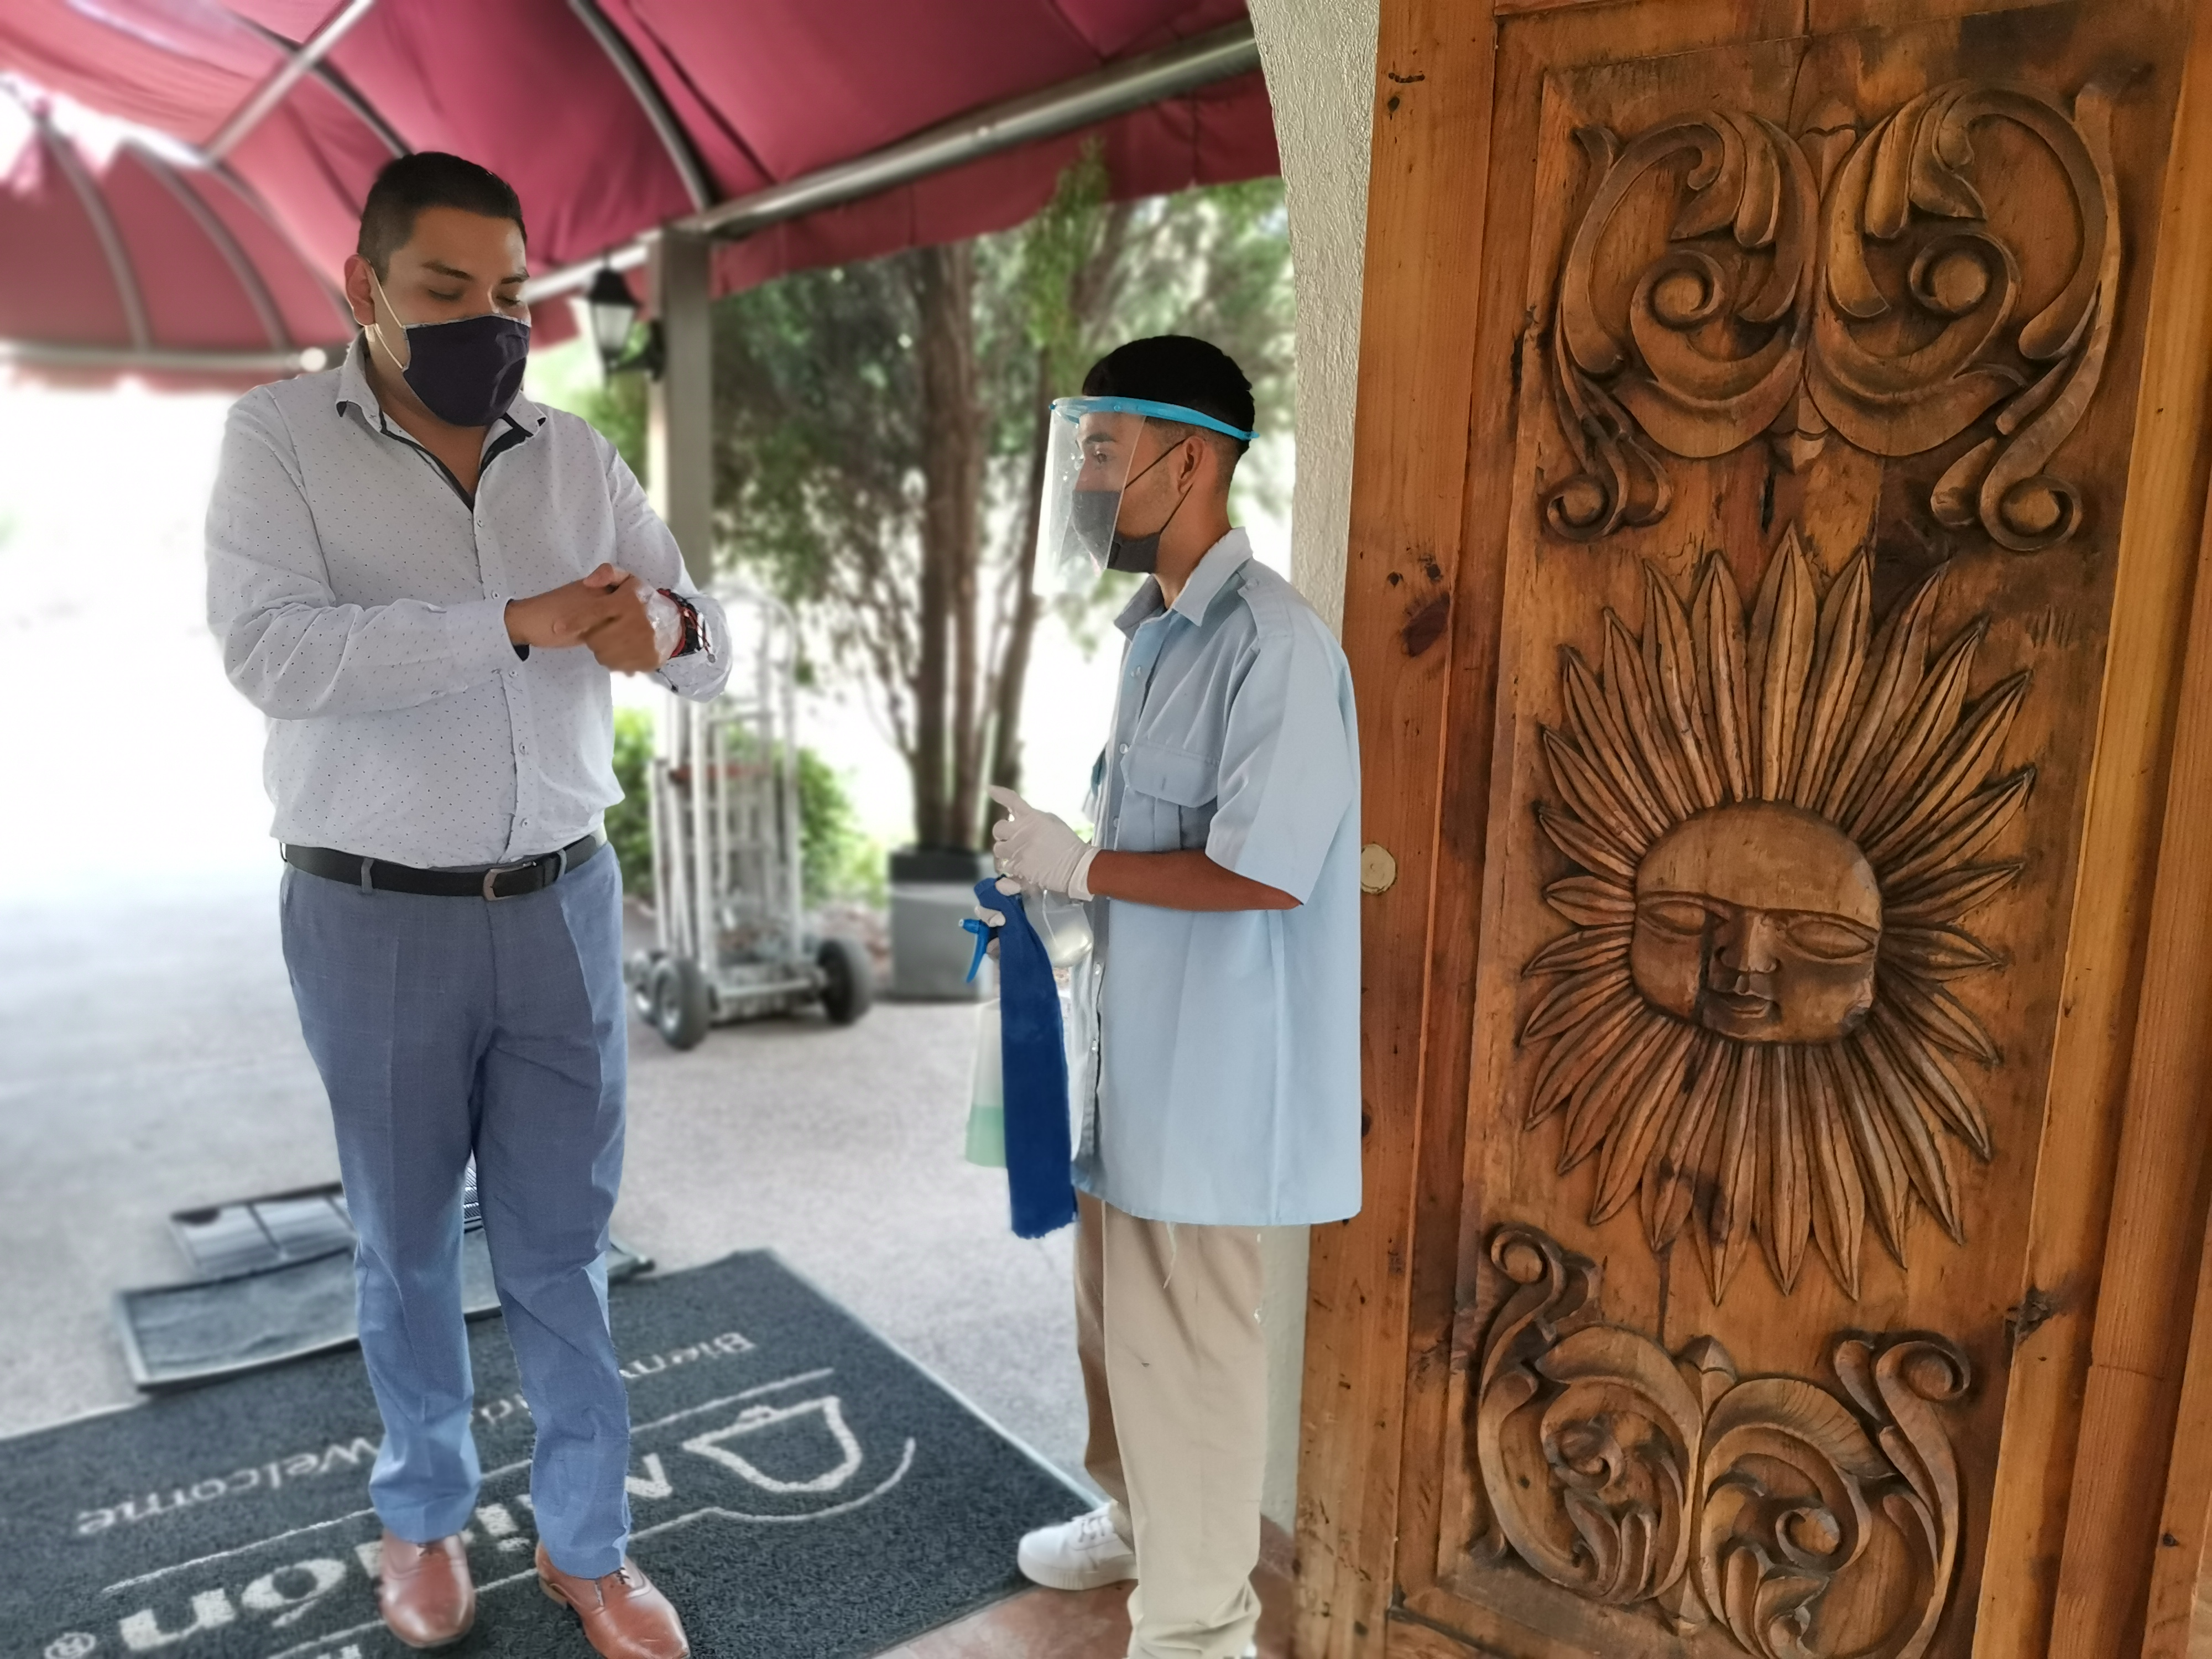 Informan horarios de atención de sitios turísticos en Silao